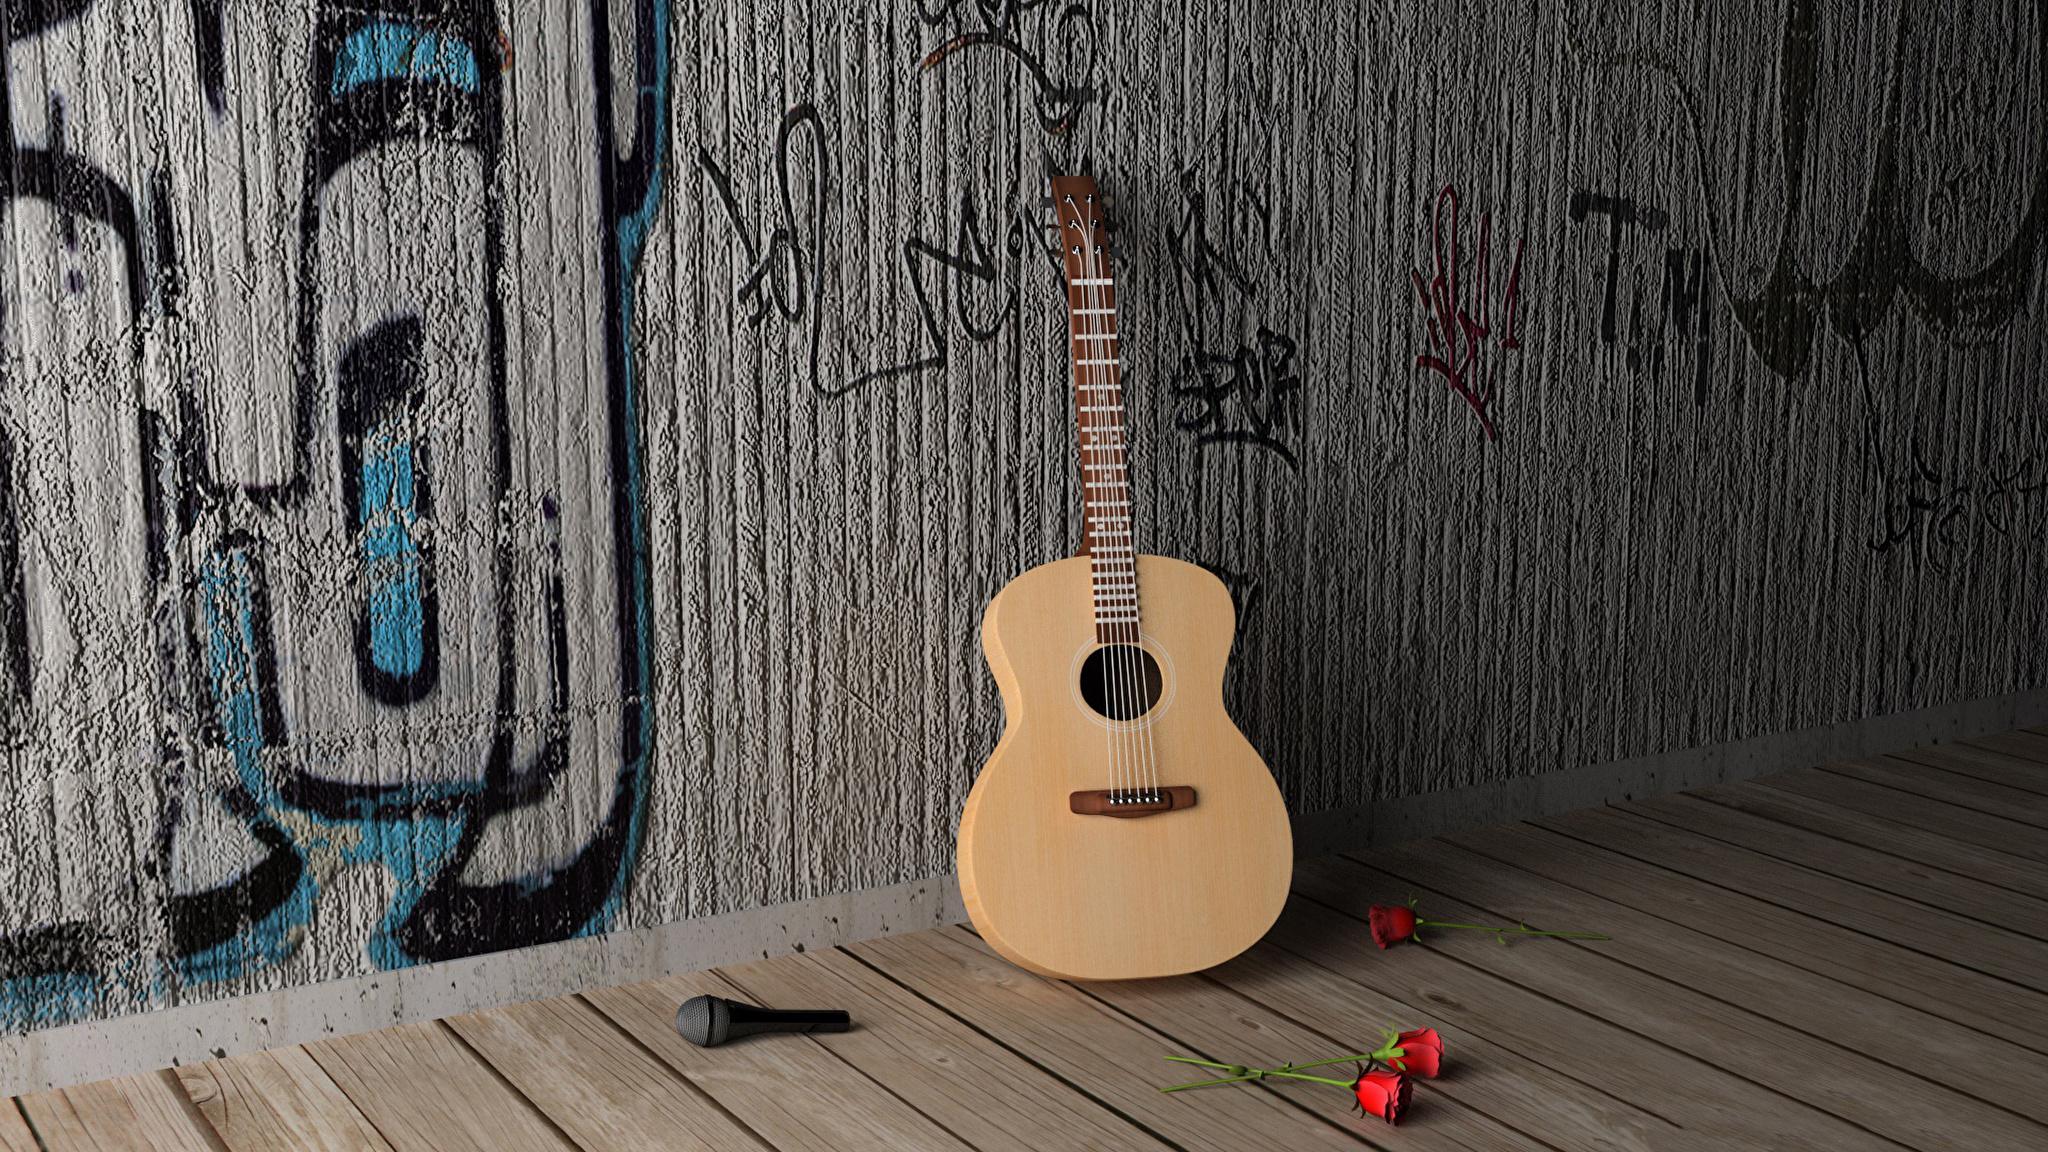 гитара музыка guitar music  № 1633740 бесплатно